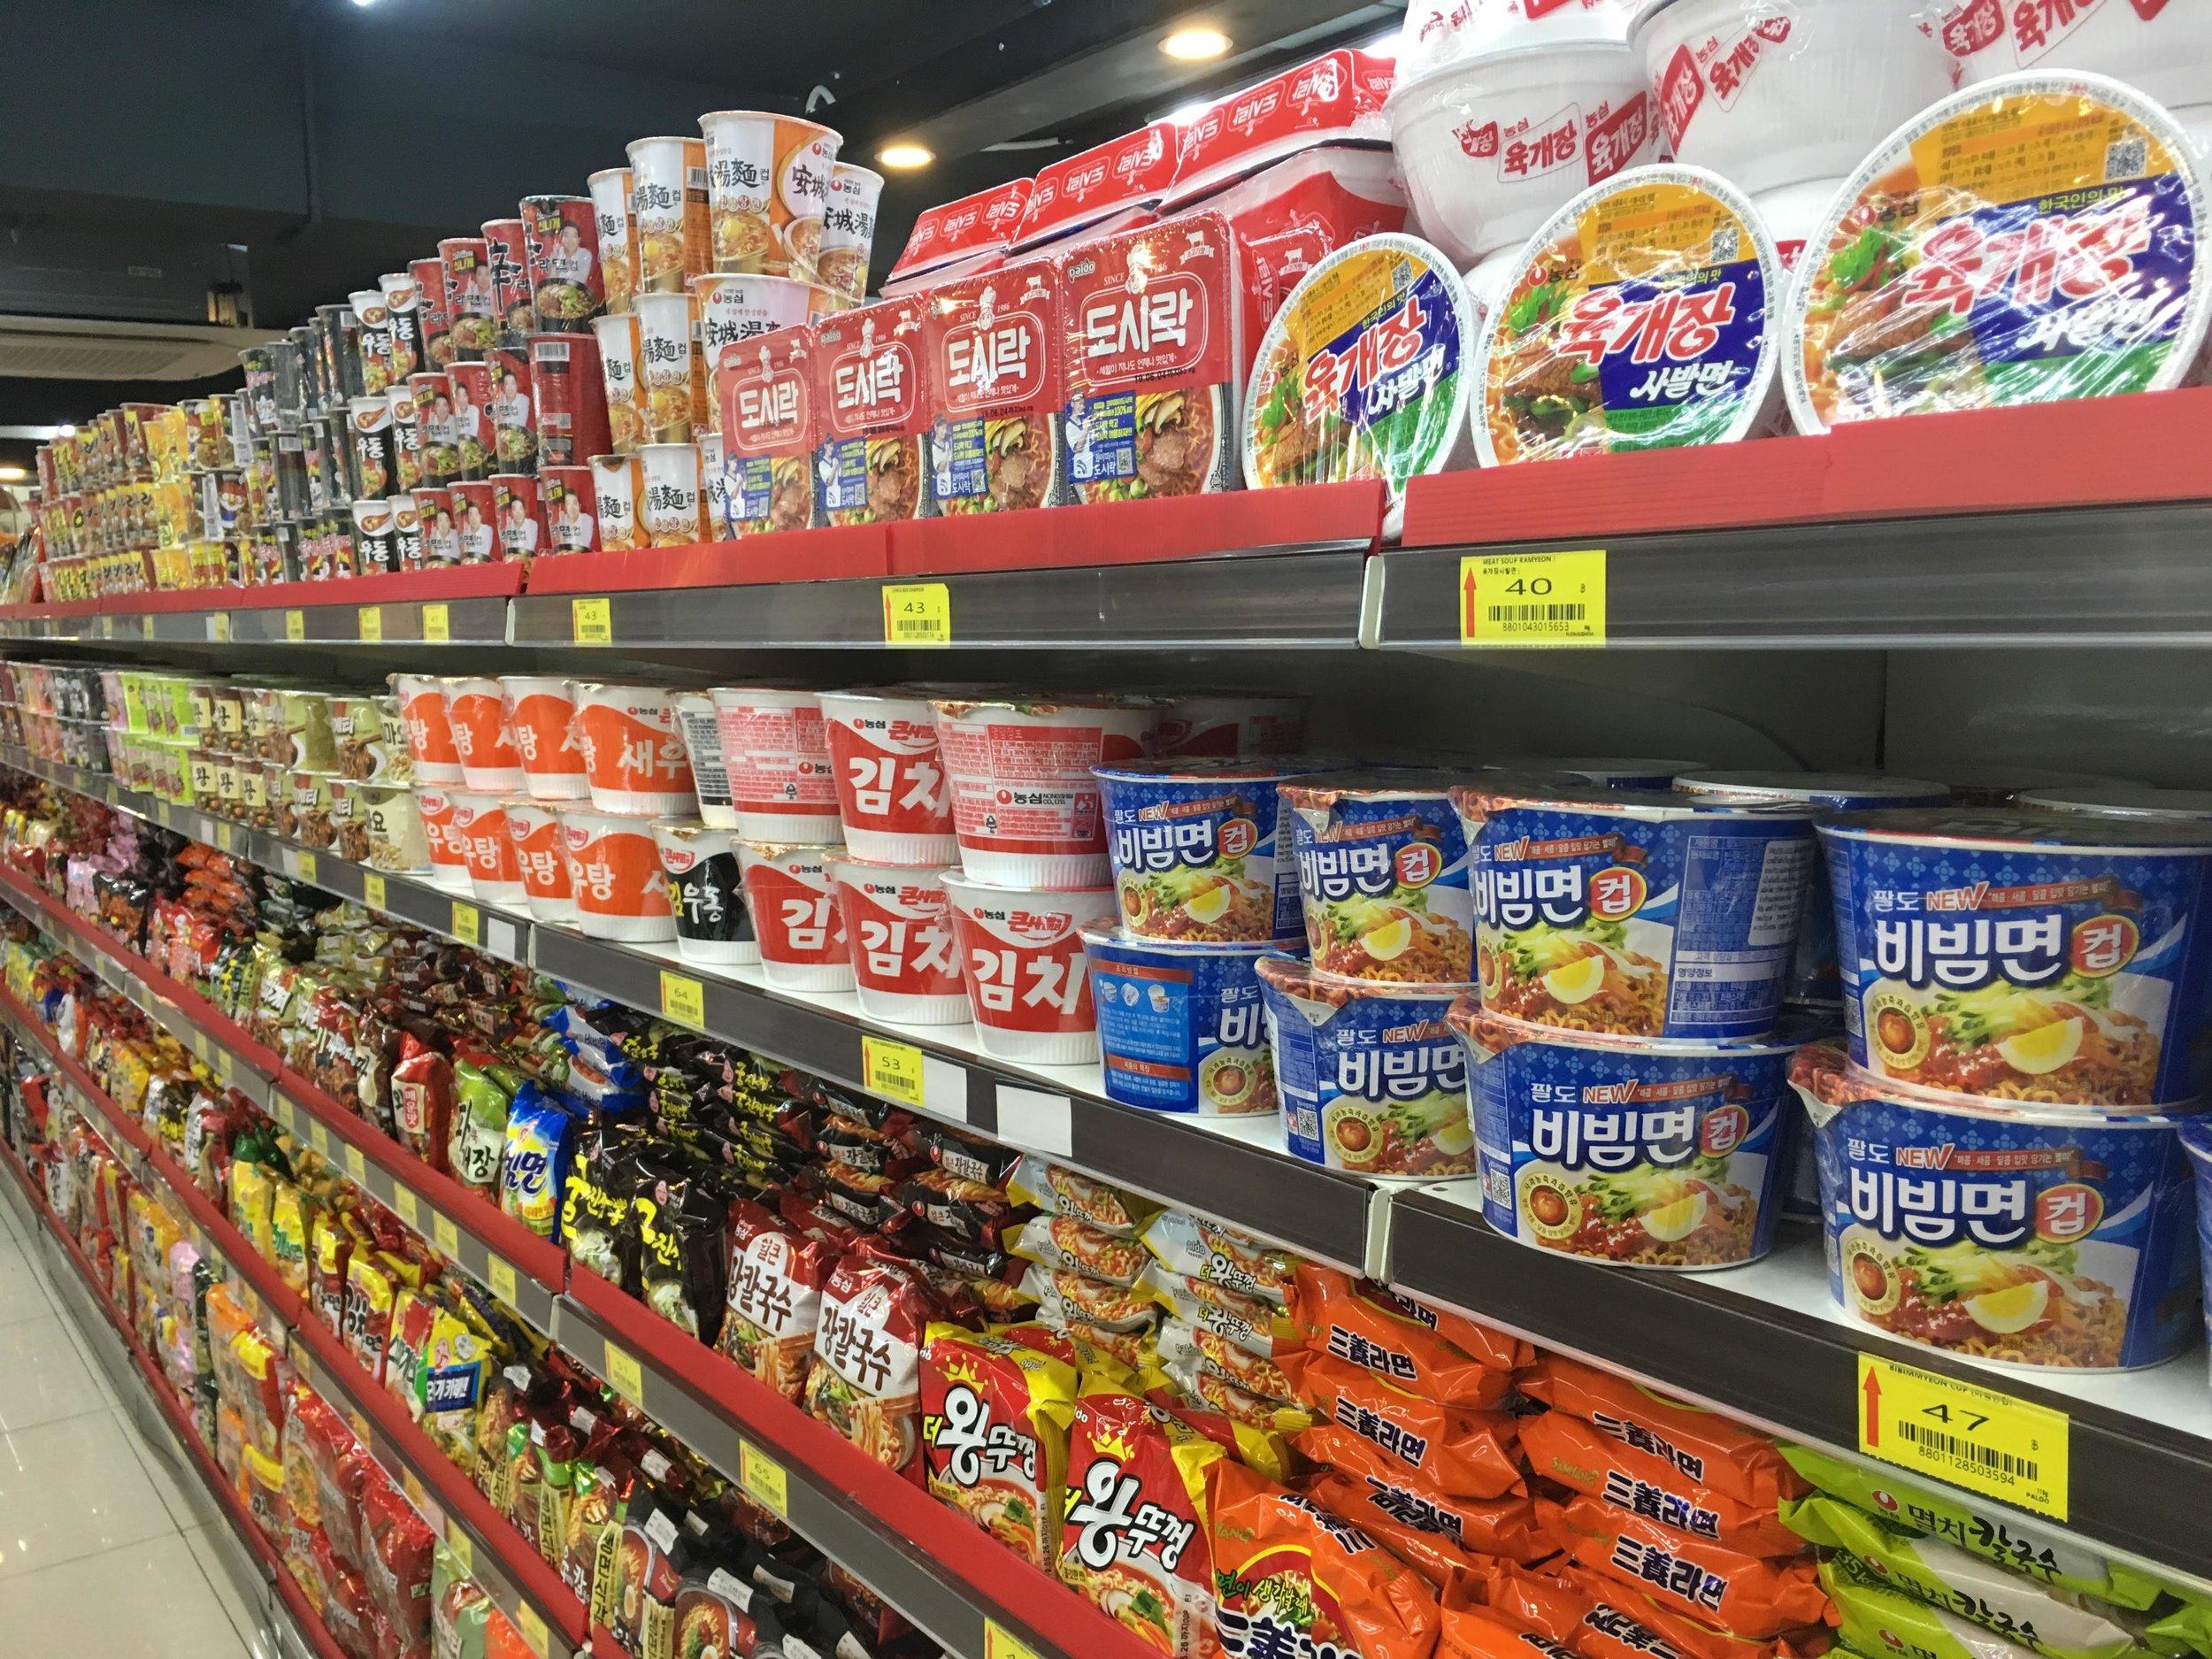 an amazing variety of Korean instant noodles available for sale at Jidubang Market, Bangkok